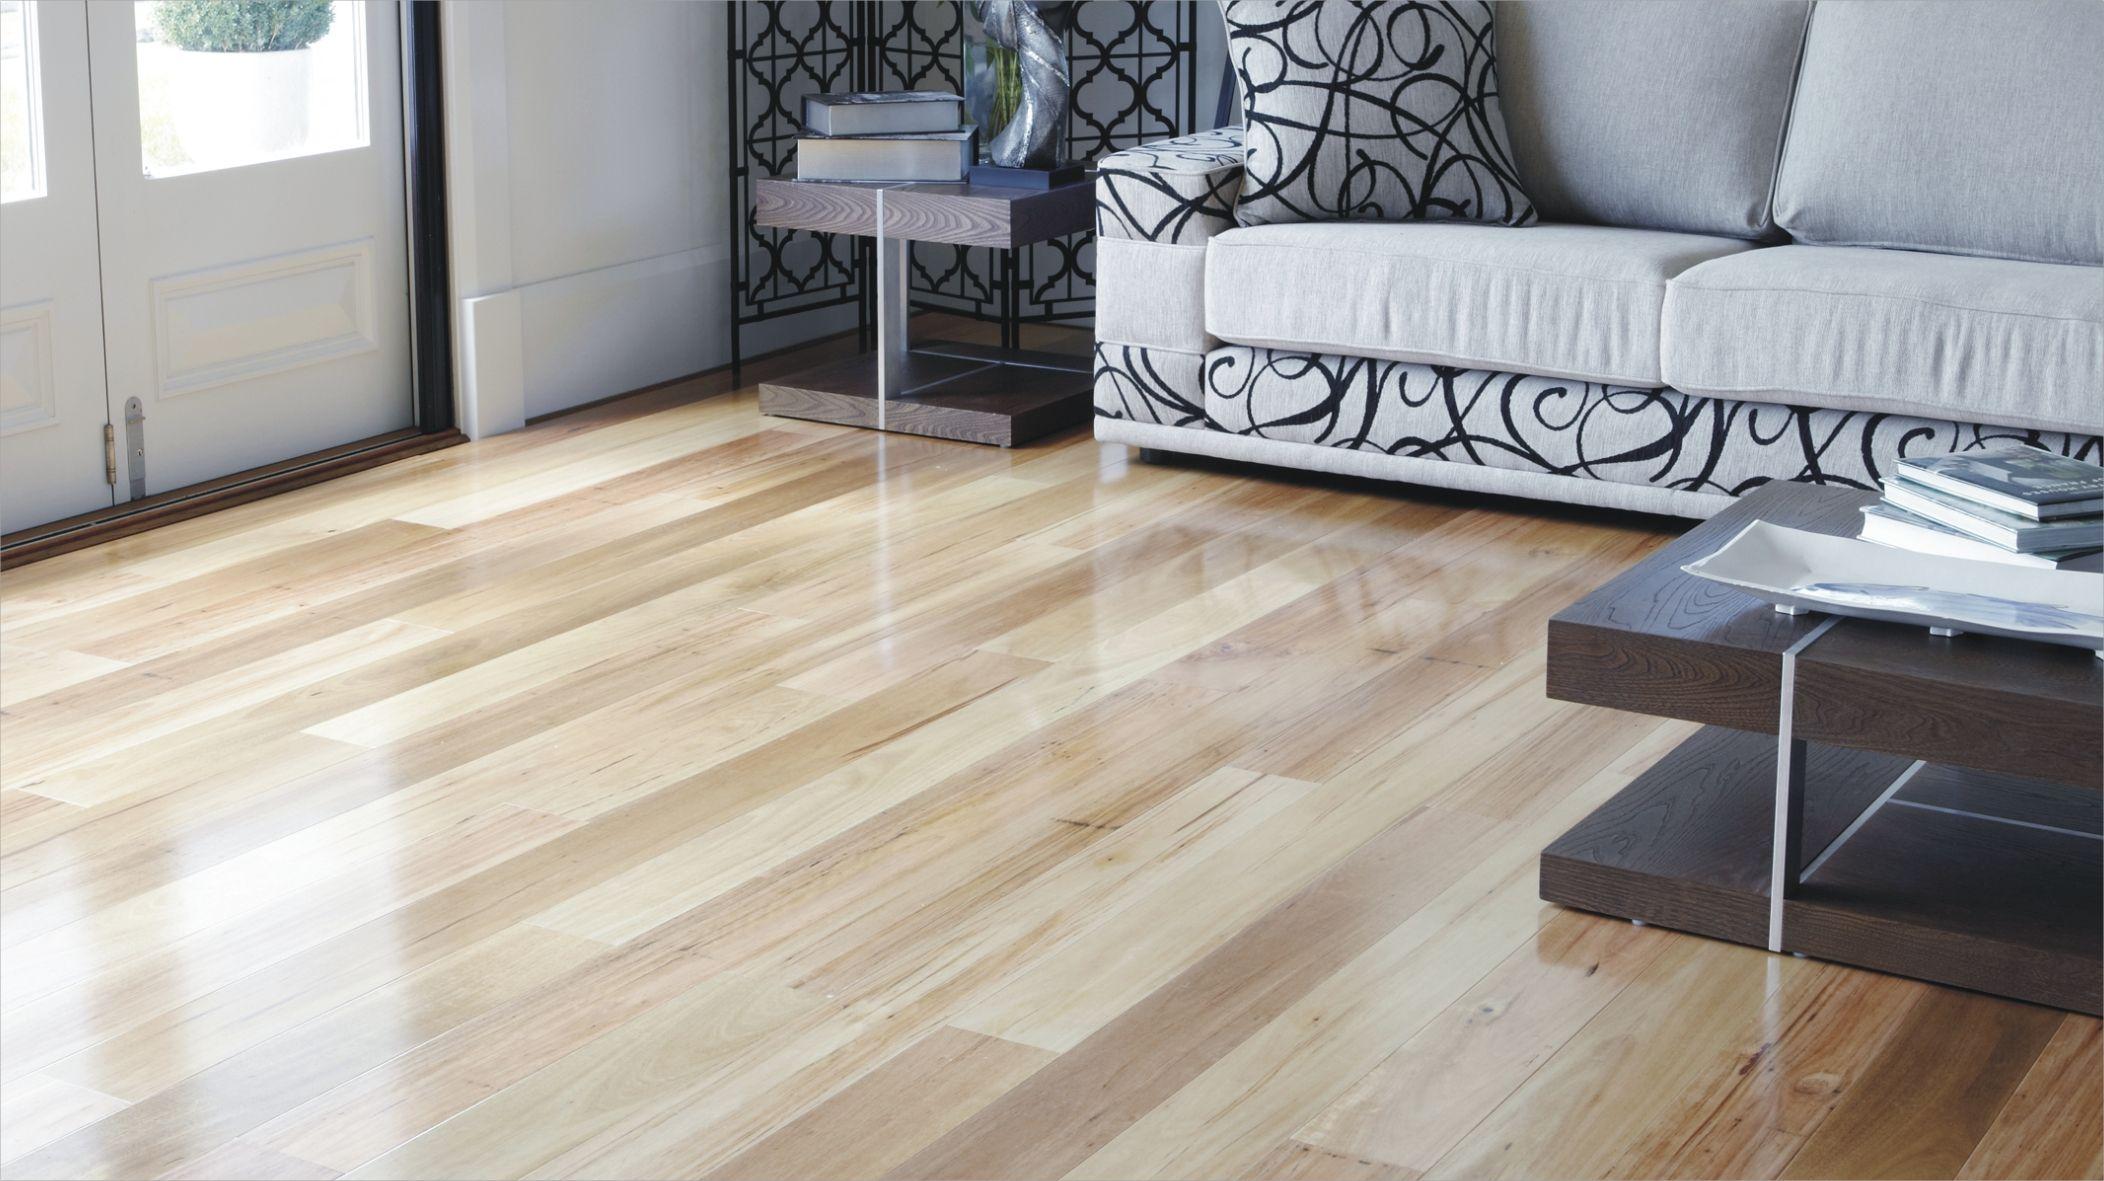 Timberamx hardwood flooring - Blackbutt  Engineered timber